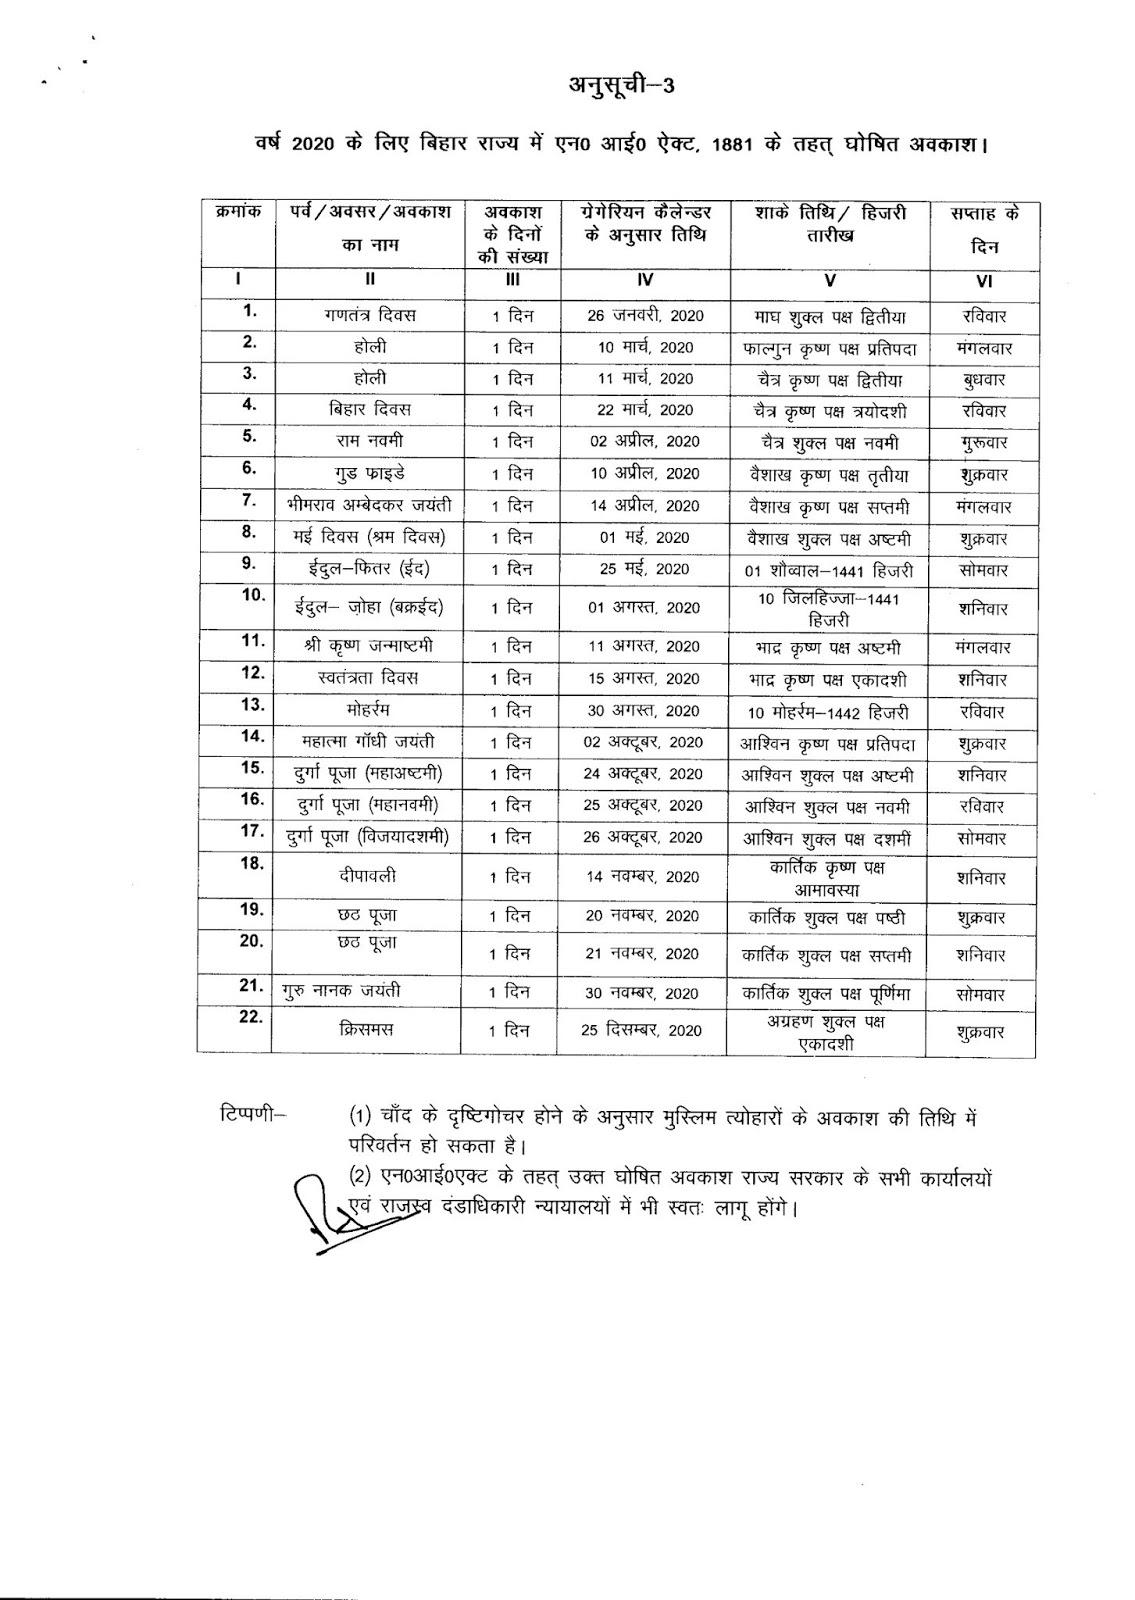 Bihar Government Calendar 2020 #educratsweb for Bihar Sarkar Calender 2020